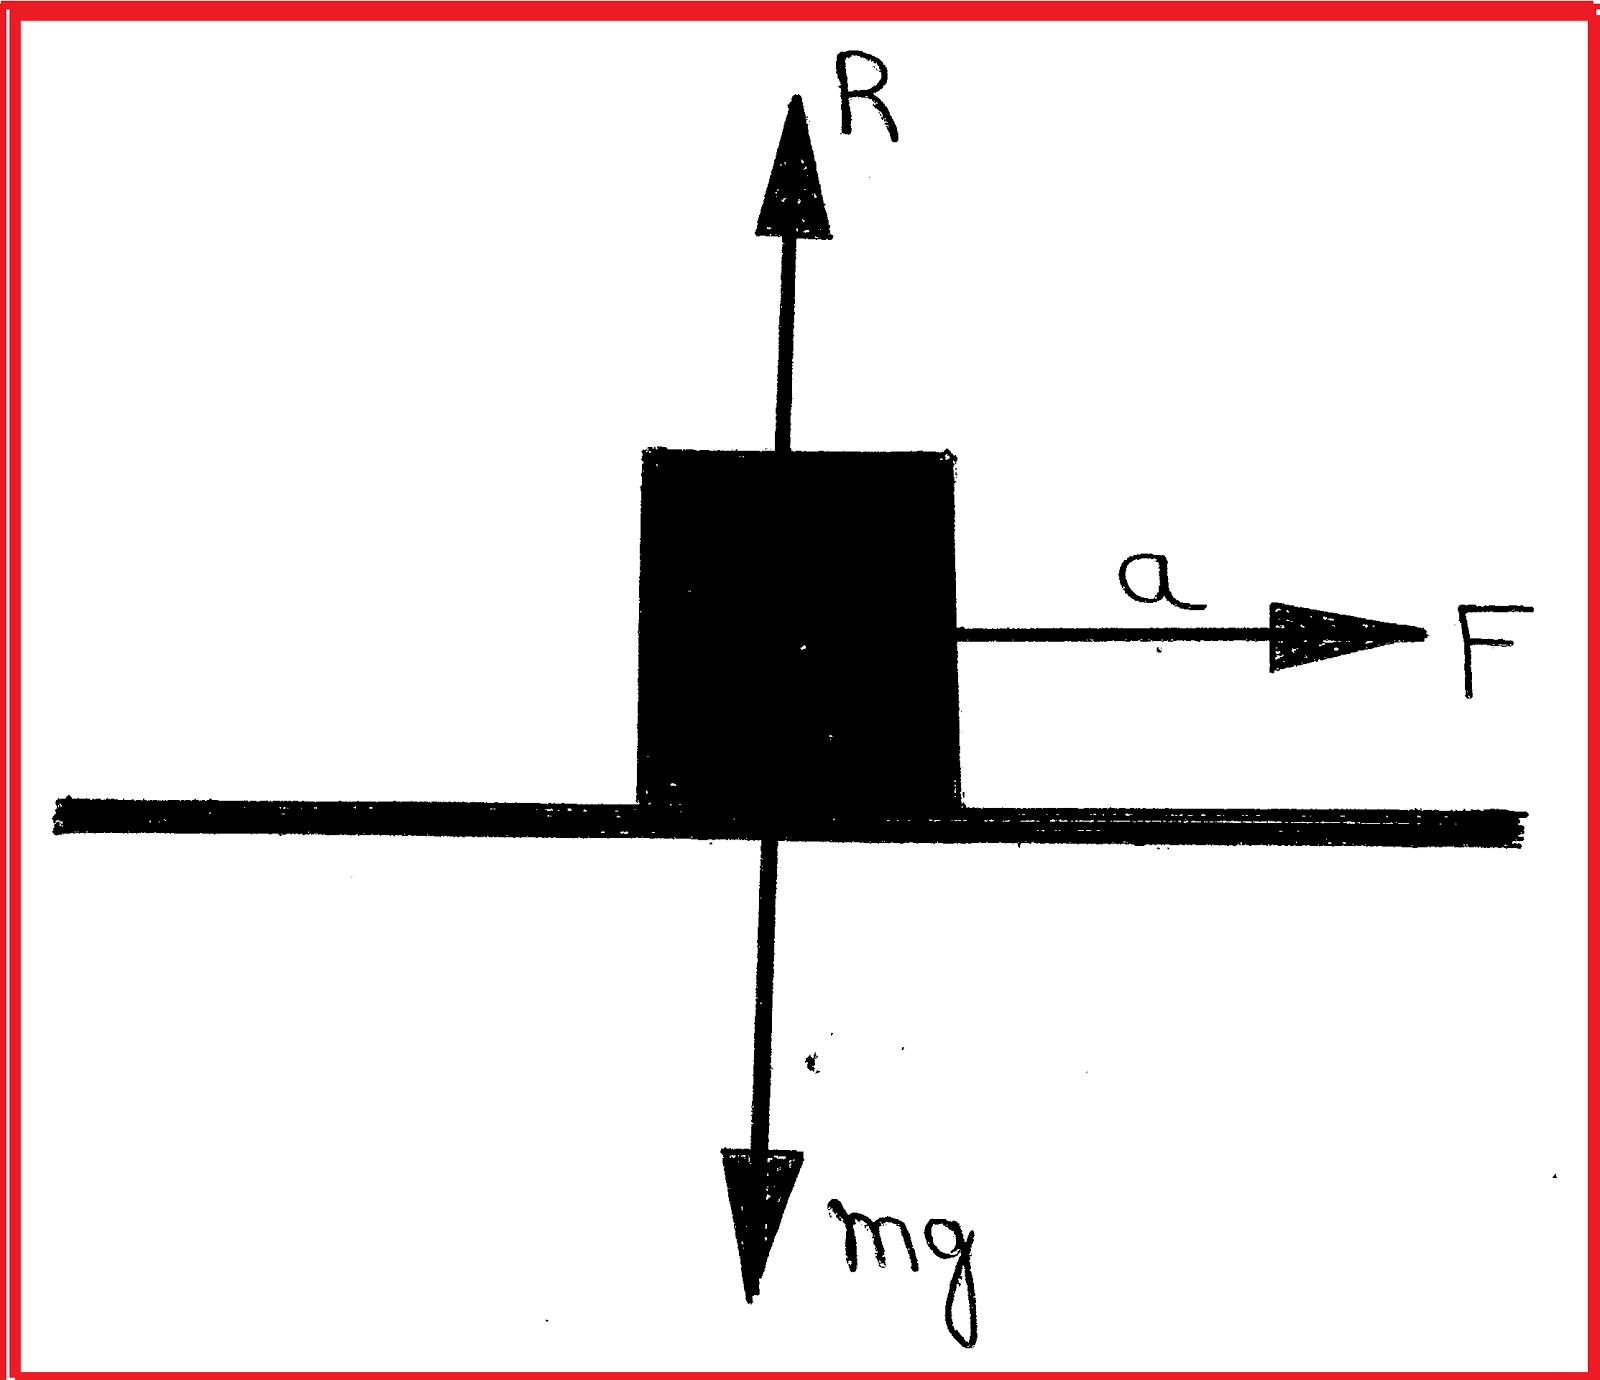 Classical Mechanics Problem on Friction